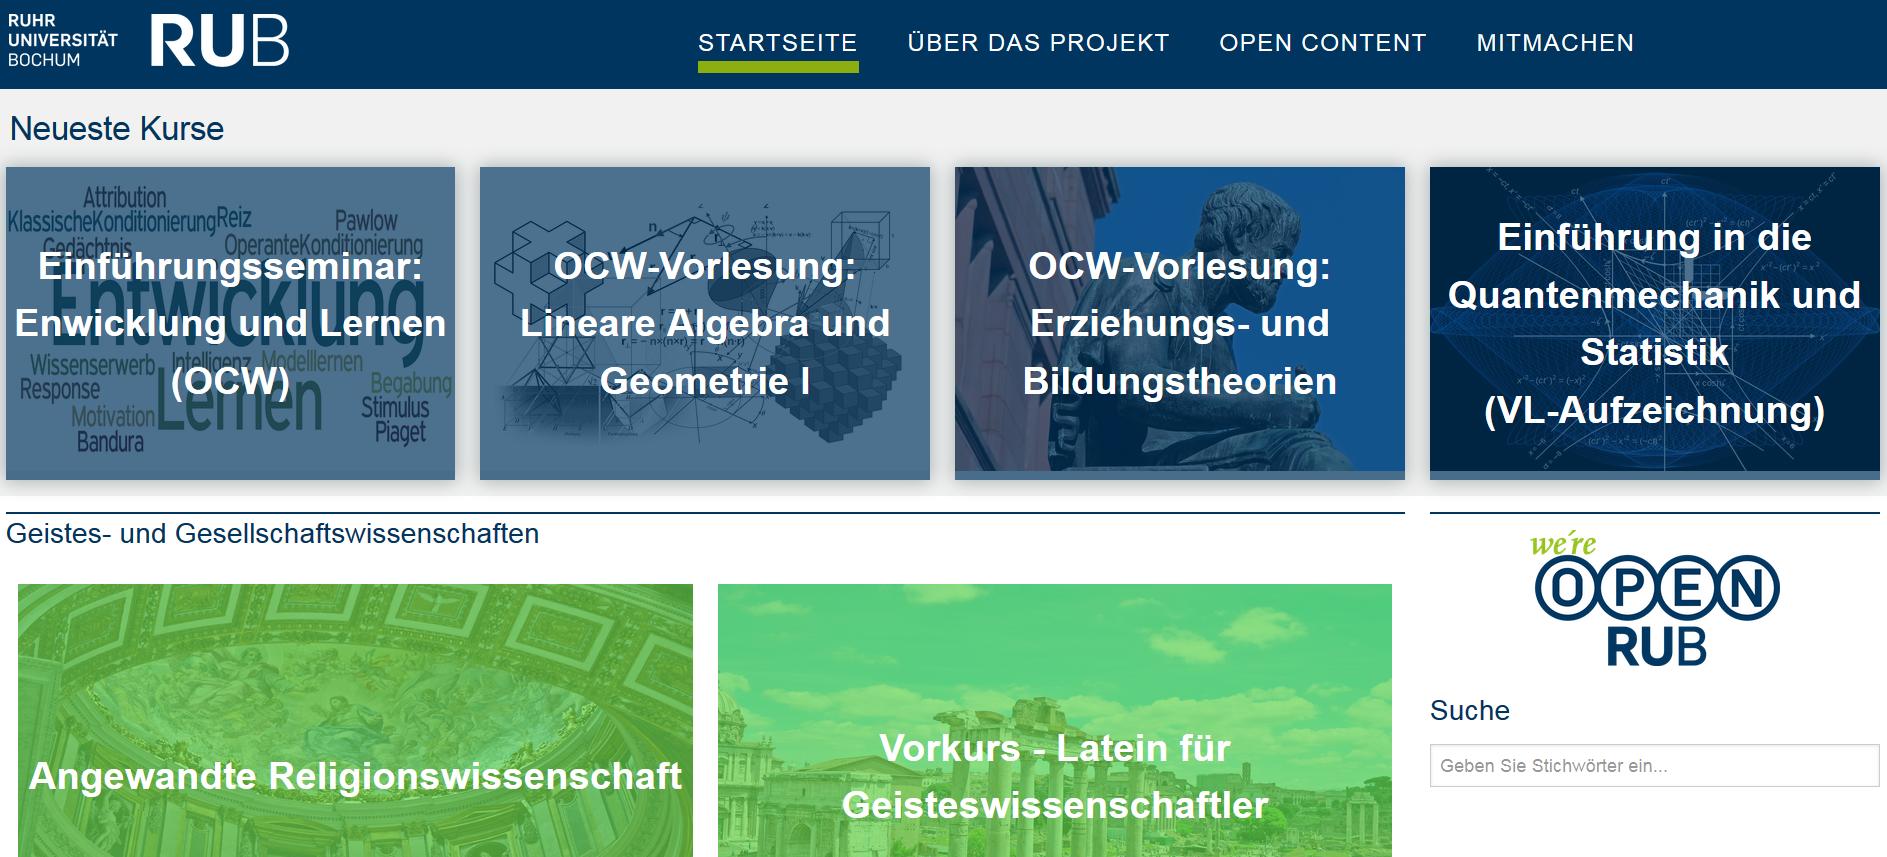 Screenshot OpenRUB Ruhr-Uni Bochum